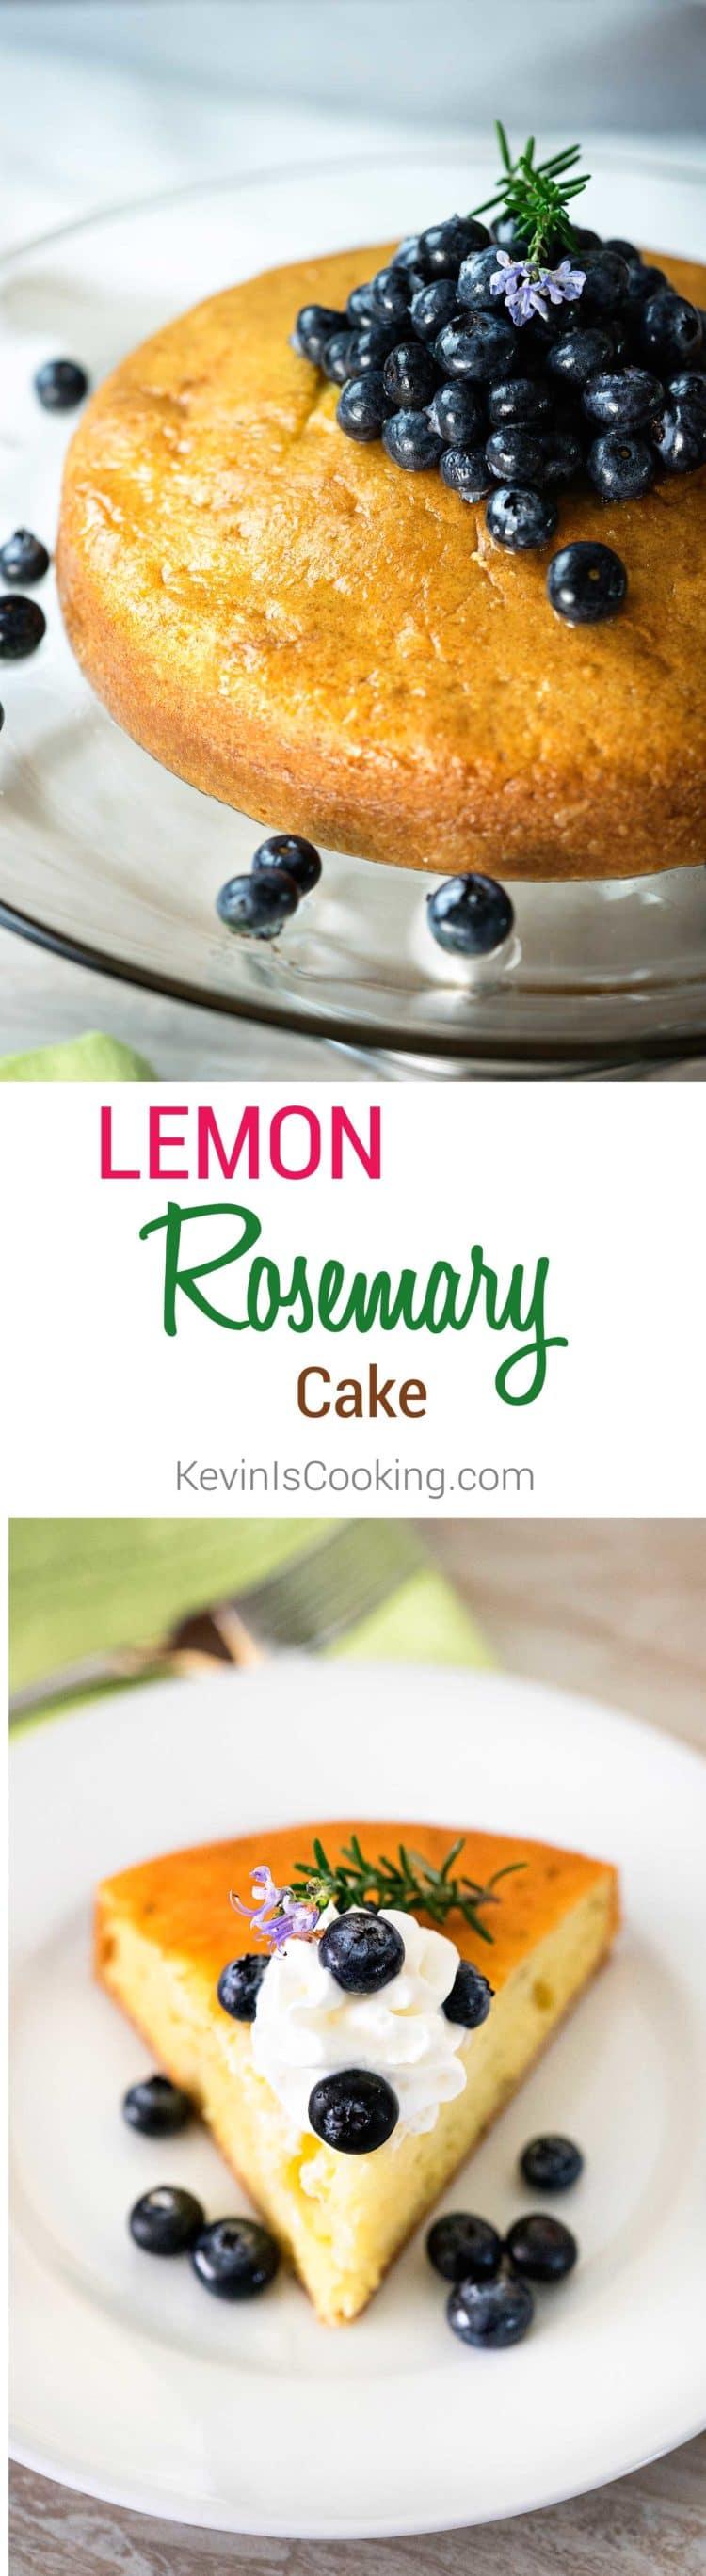 Lemon Rosemary Cake. www.keviniscooking.com